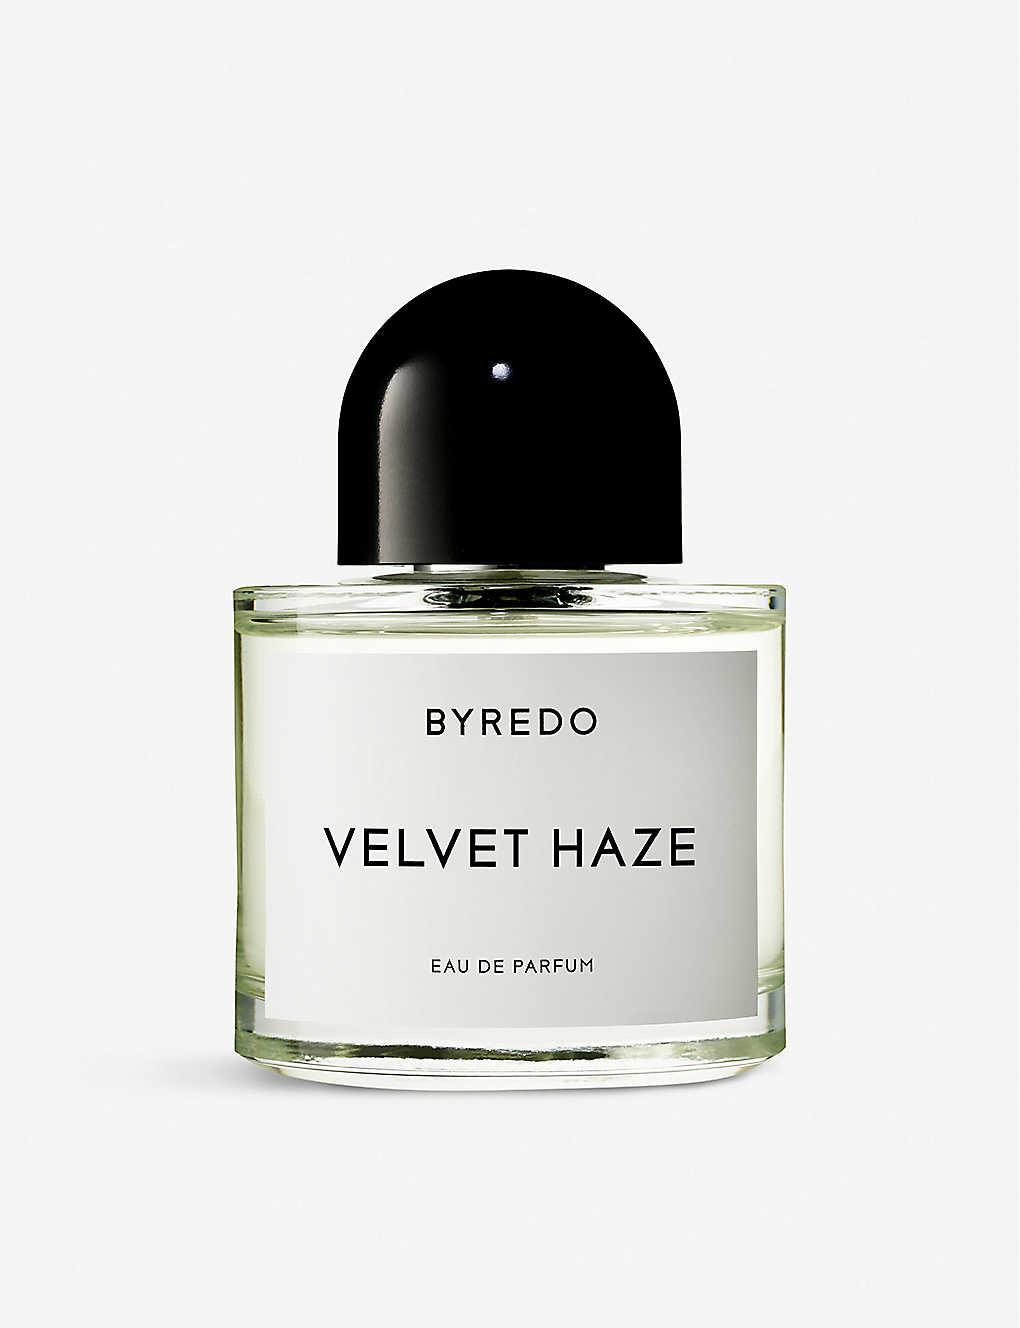 Byredo Velvet Haze Eau De Parfum 50ml100ml Selfridgescom